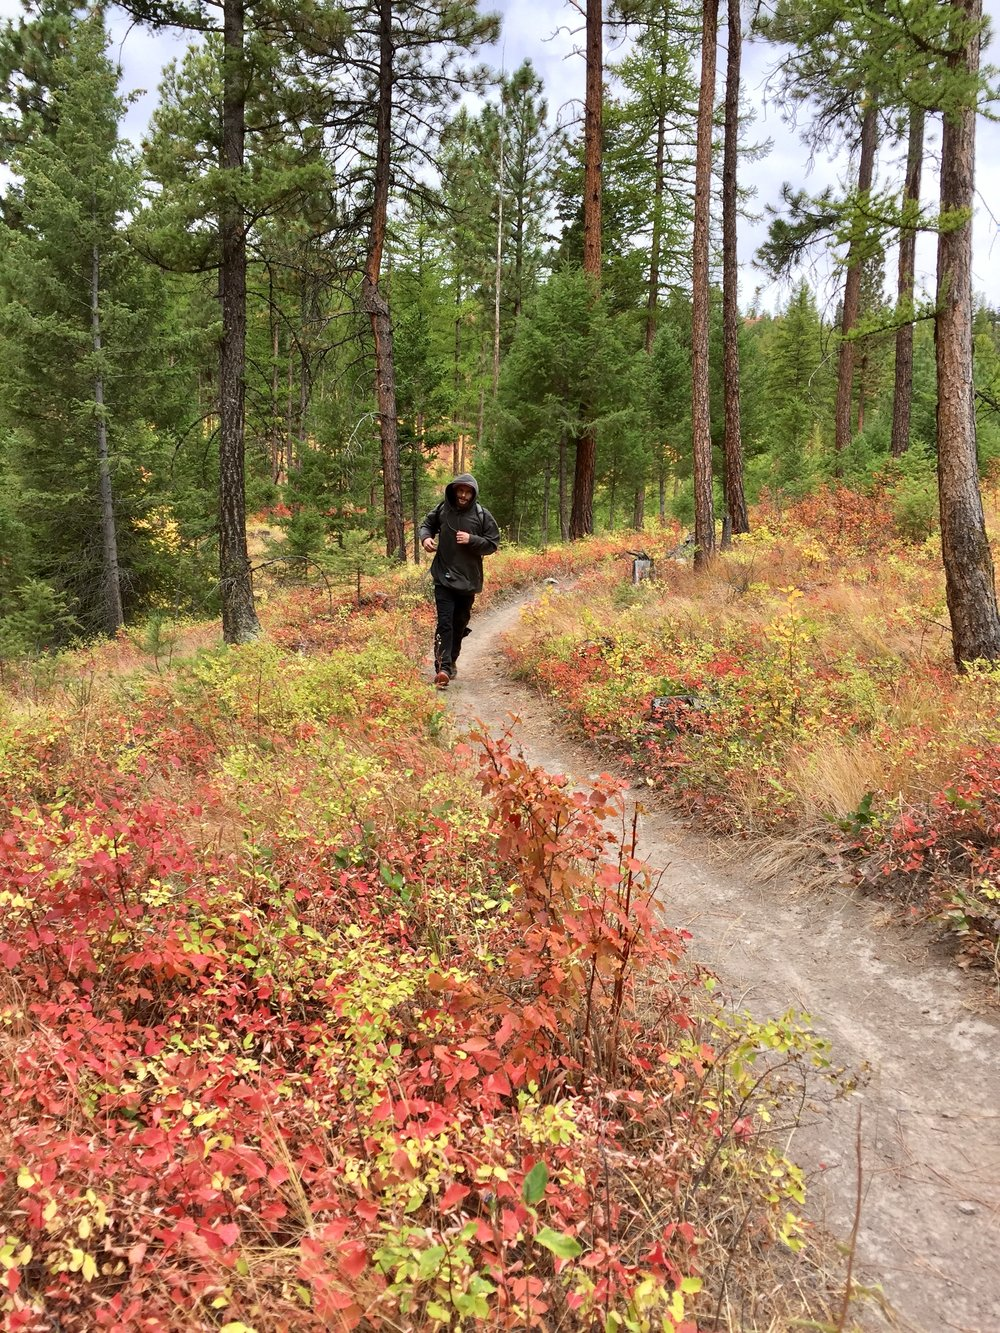 foys to blacktail trails trail marathon ftbtIMG_6640.JPG